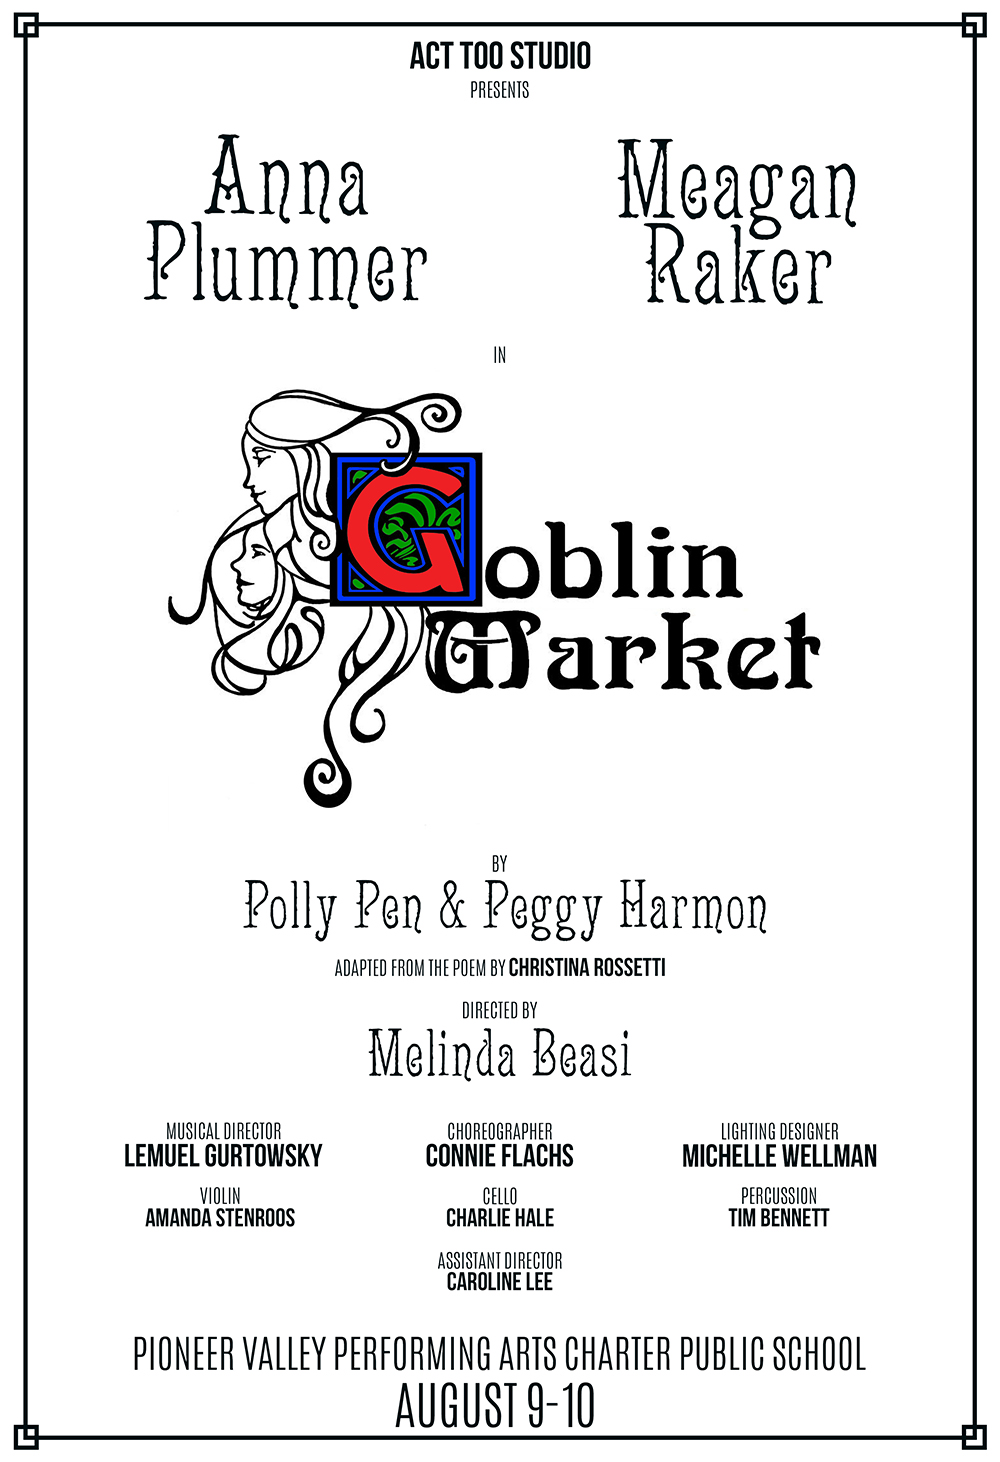 Goblin Market.psd